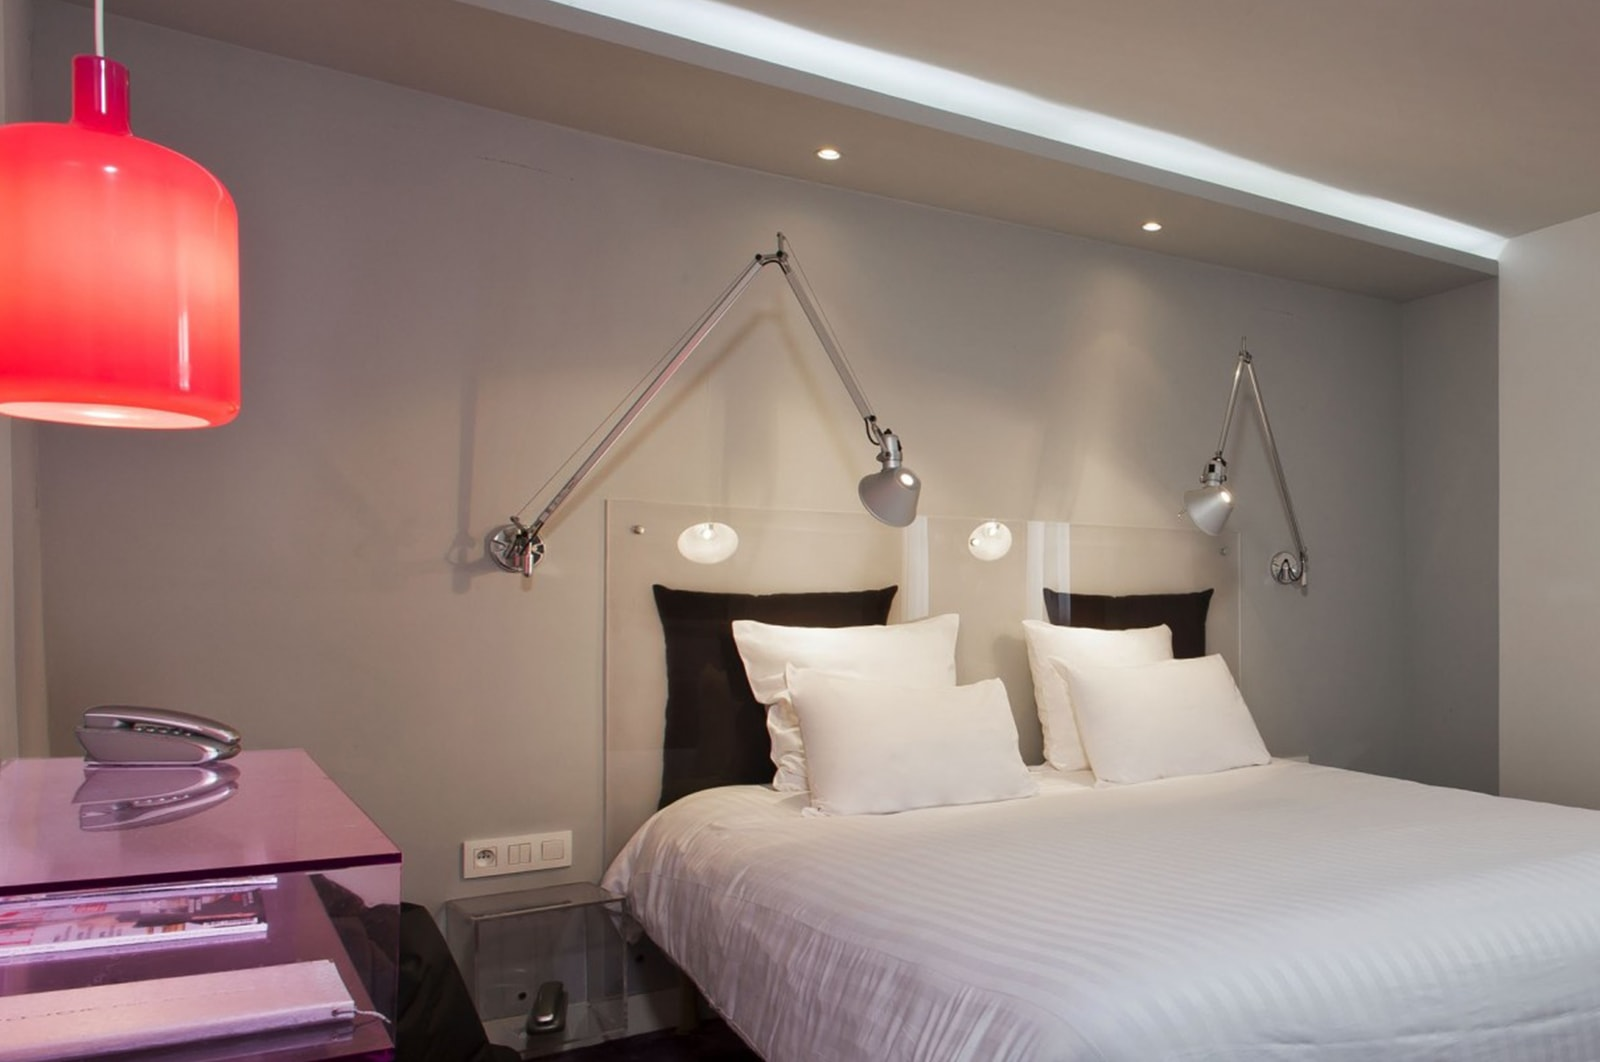 Matrimoniale de luxe color design hotel paris gare for Color design hotel paris